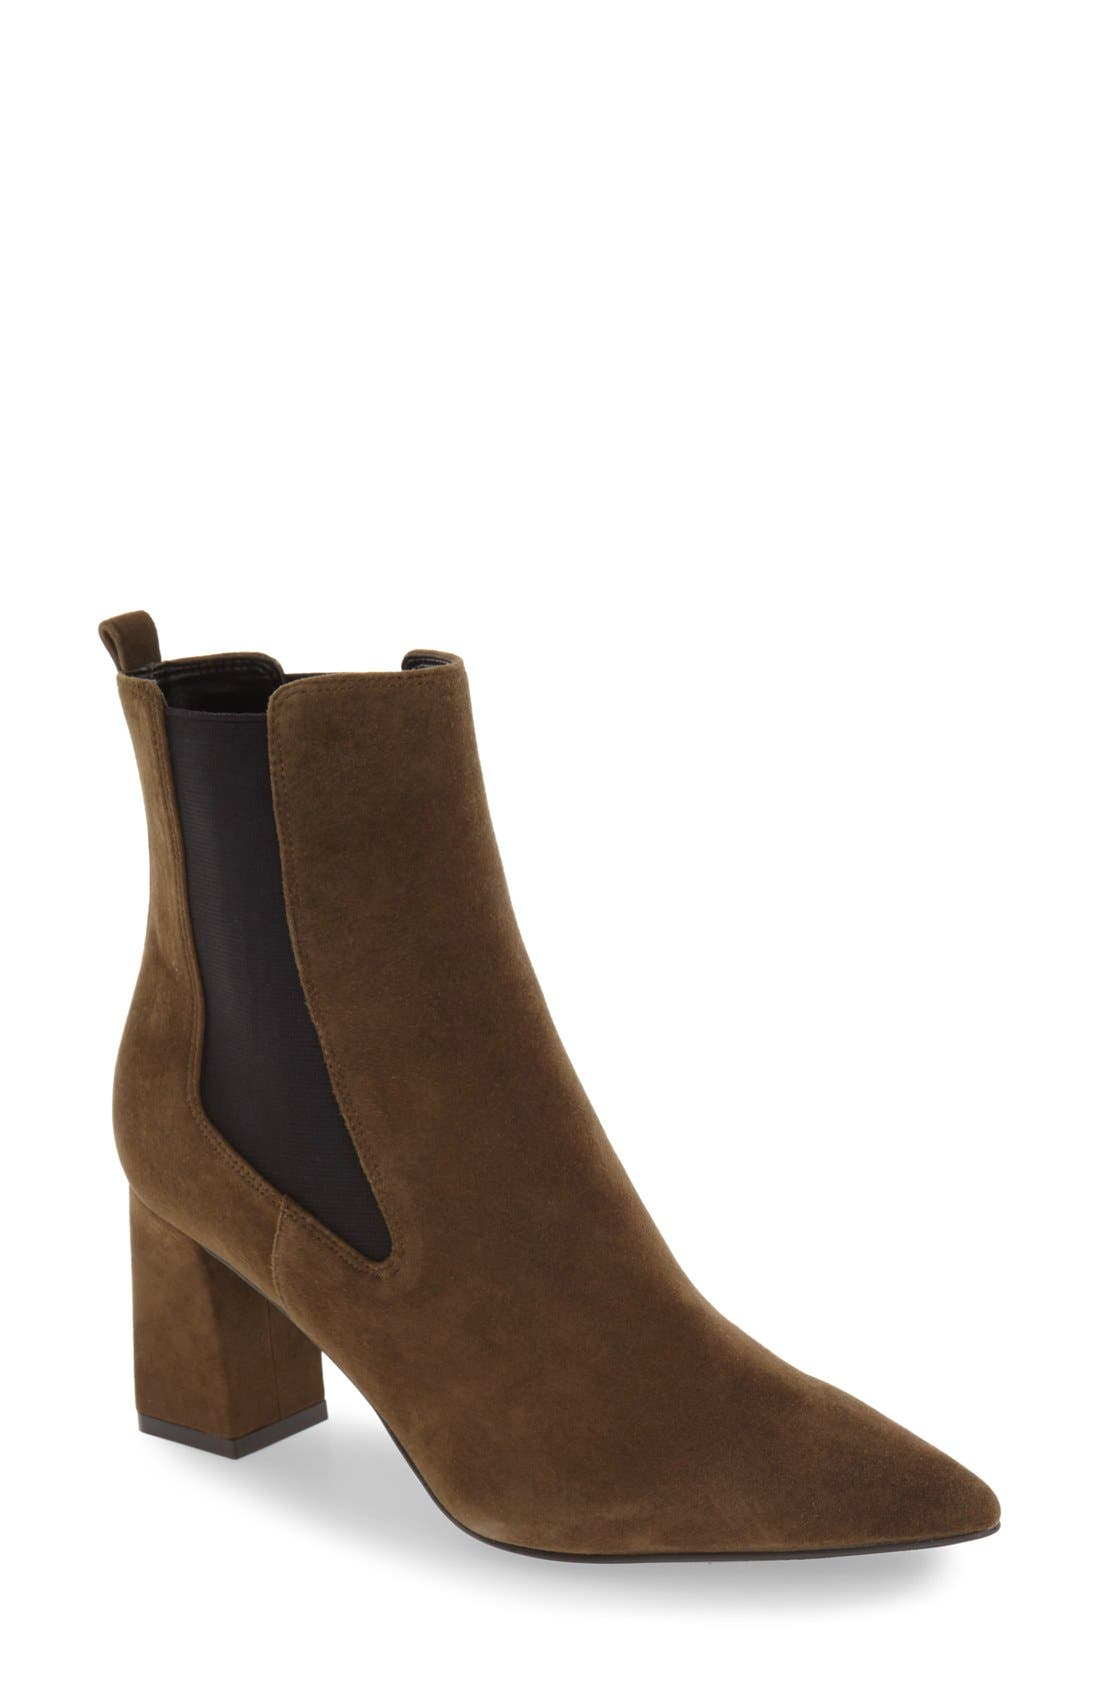 Main Image - Marc Fisher LTD 'Zanna' Chelsea Boot (Women)